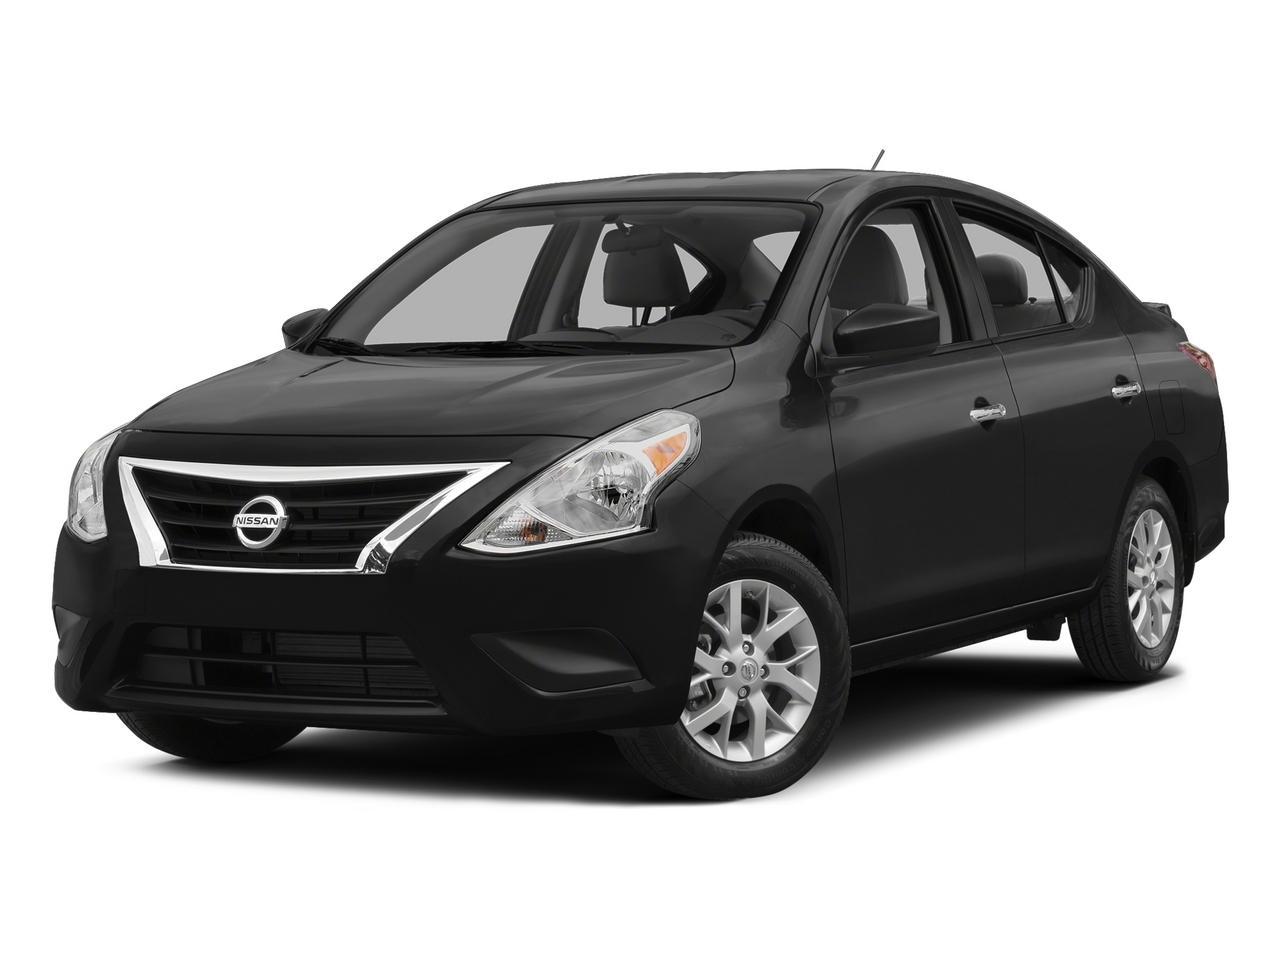 2015 Nissan Versa Vehicle Photo in Corpus Christi, TX 78411